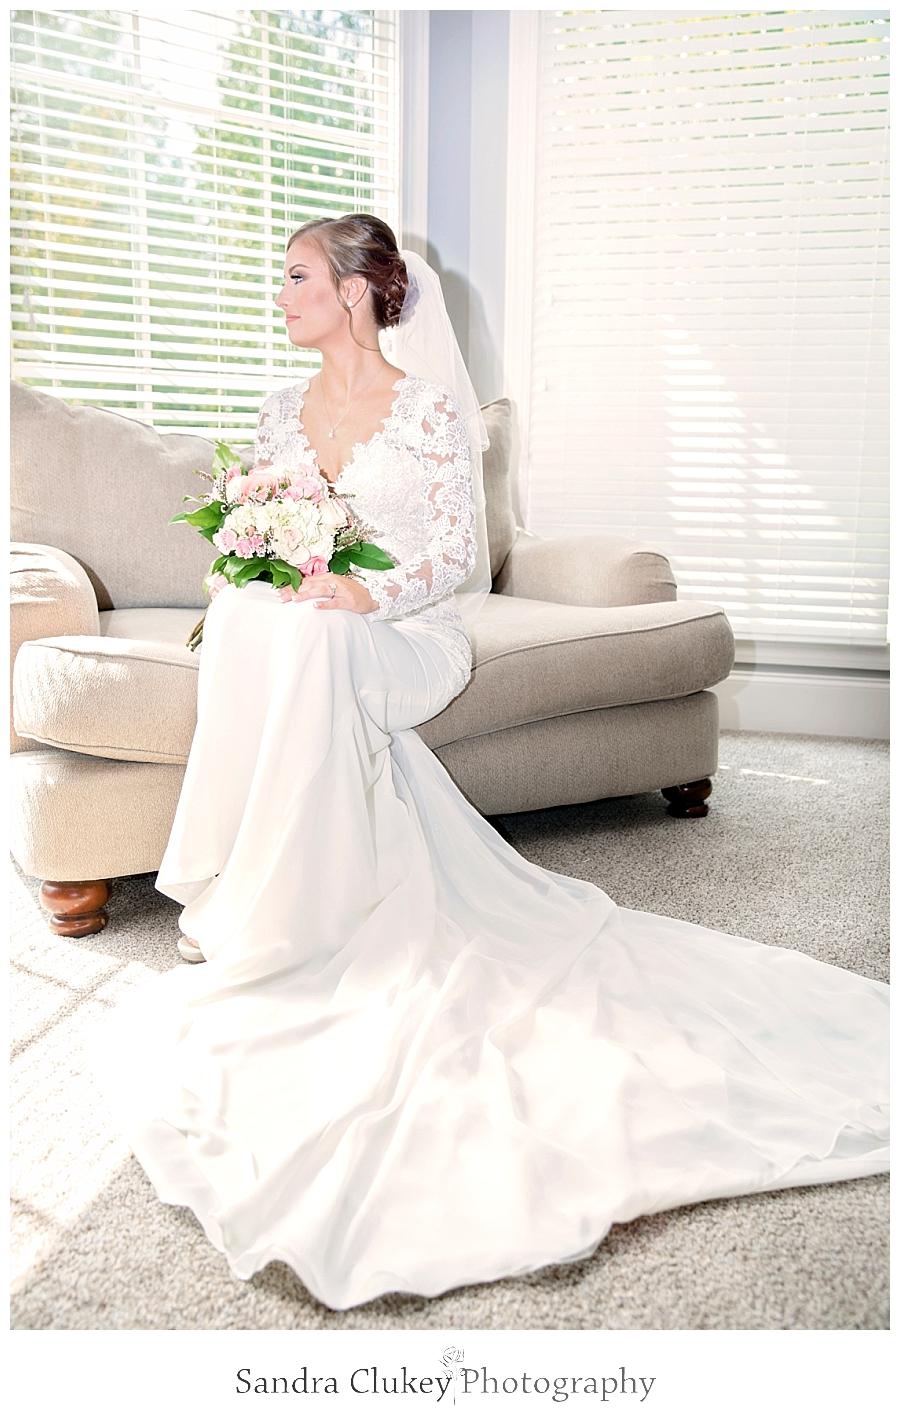 Exquisite bridal portrait of bride by window.